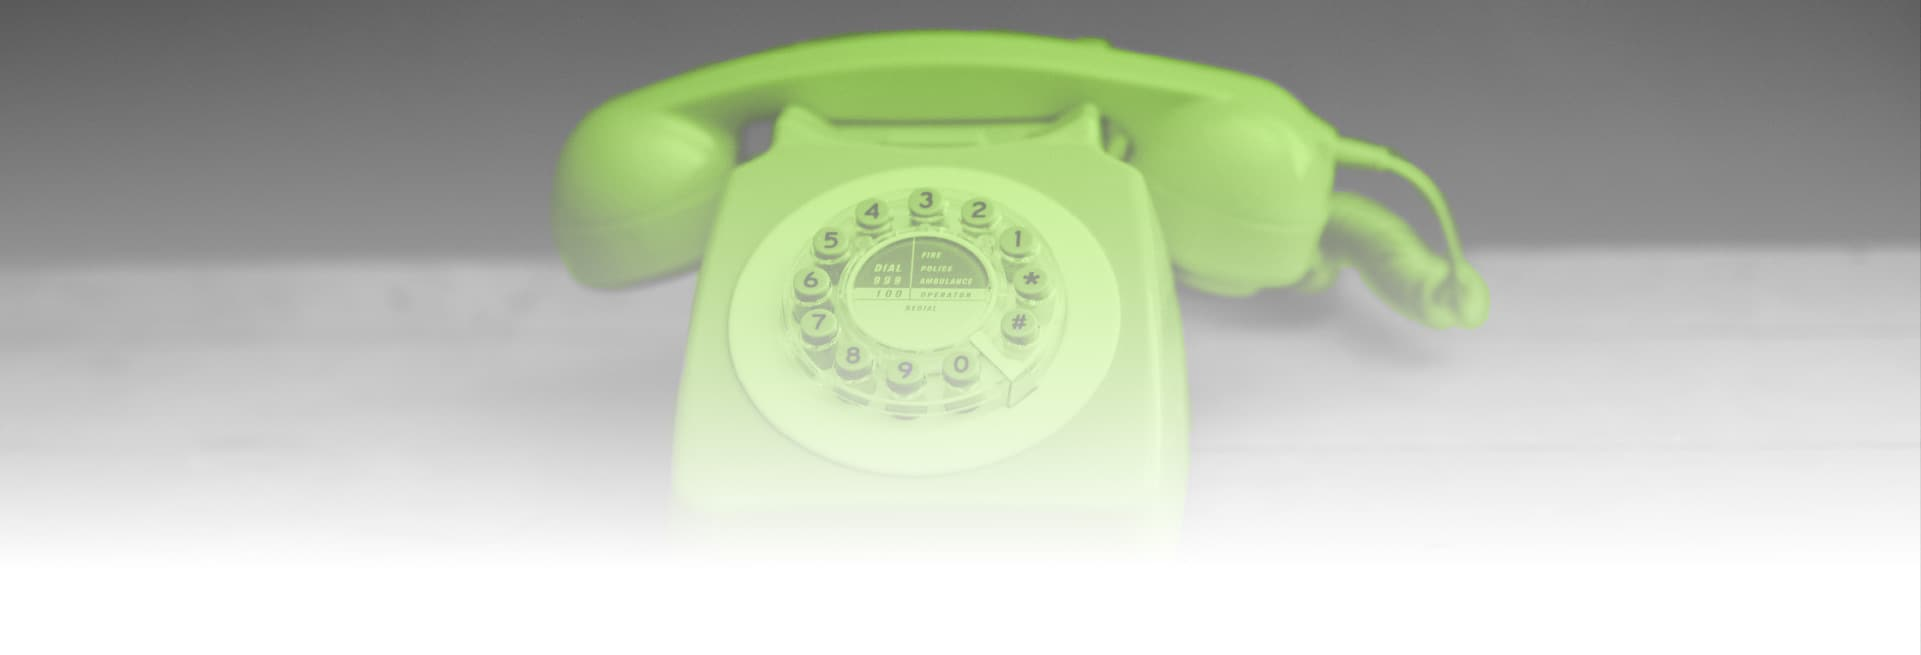 phoneta-phone-image-80